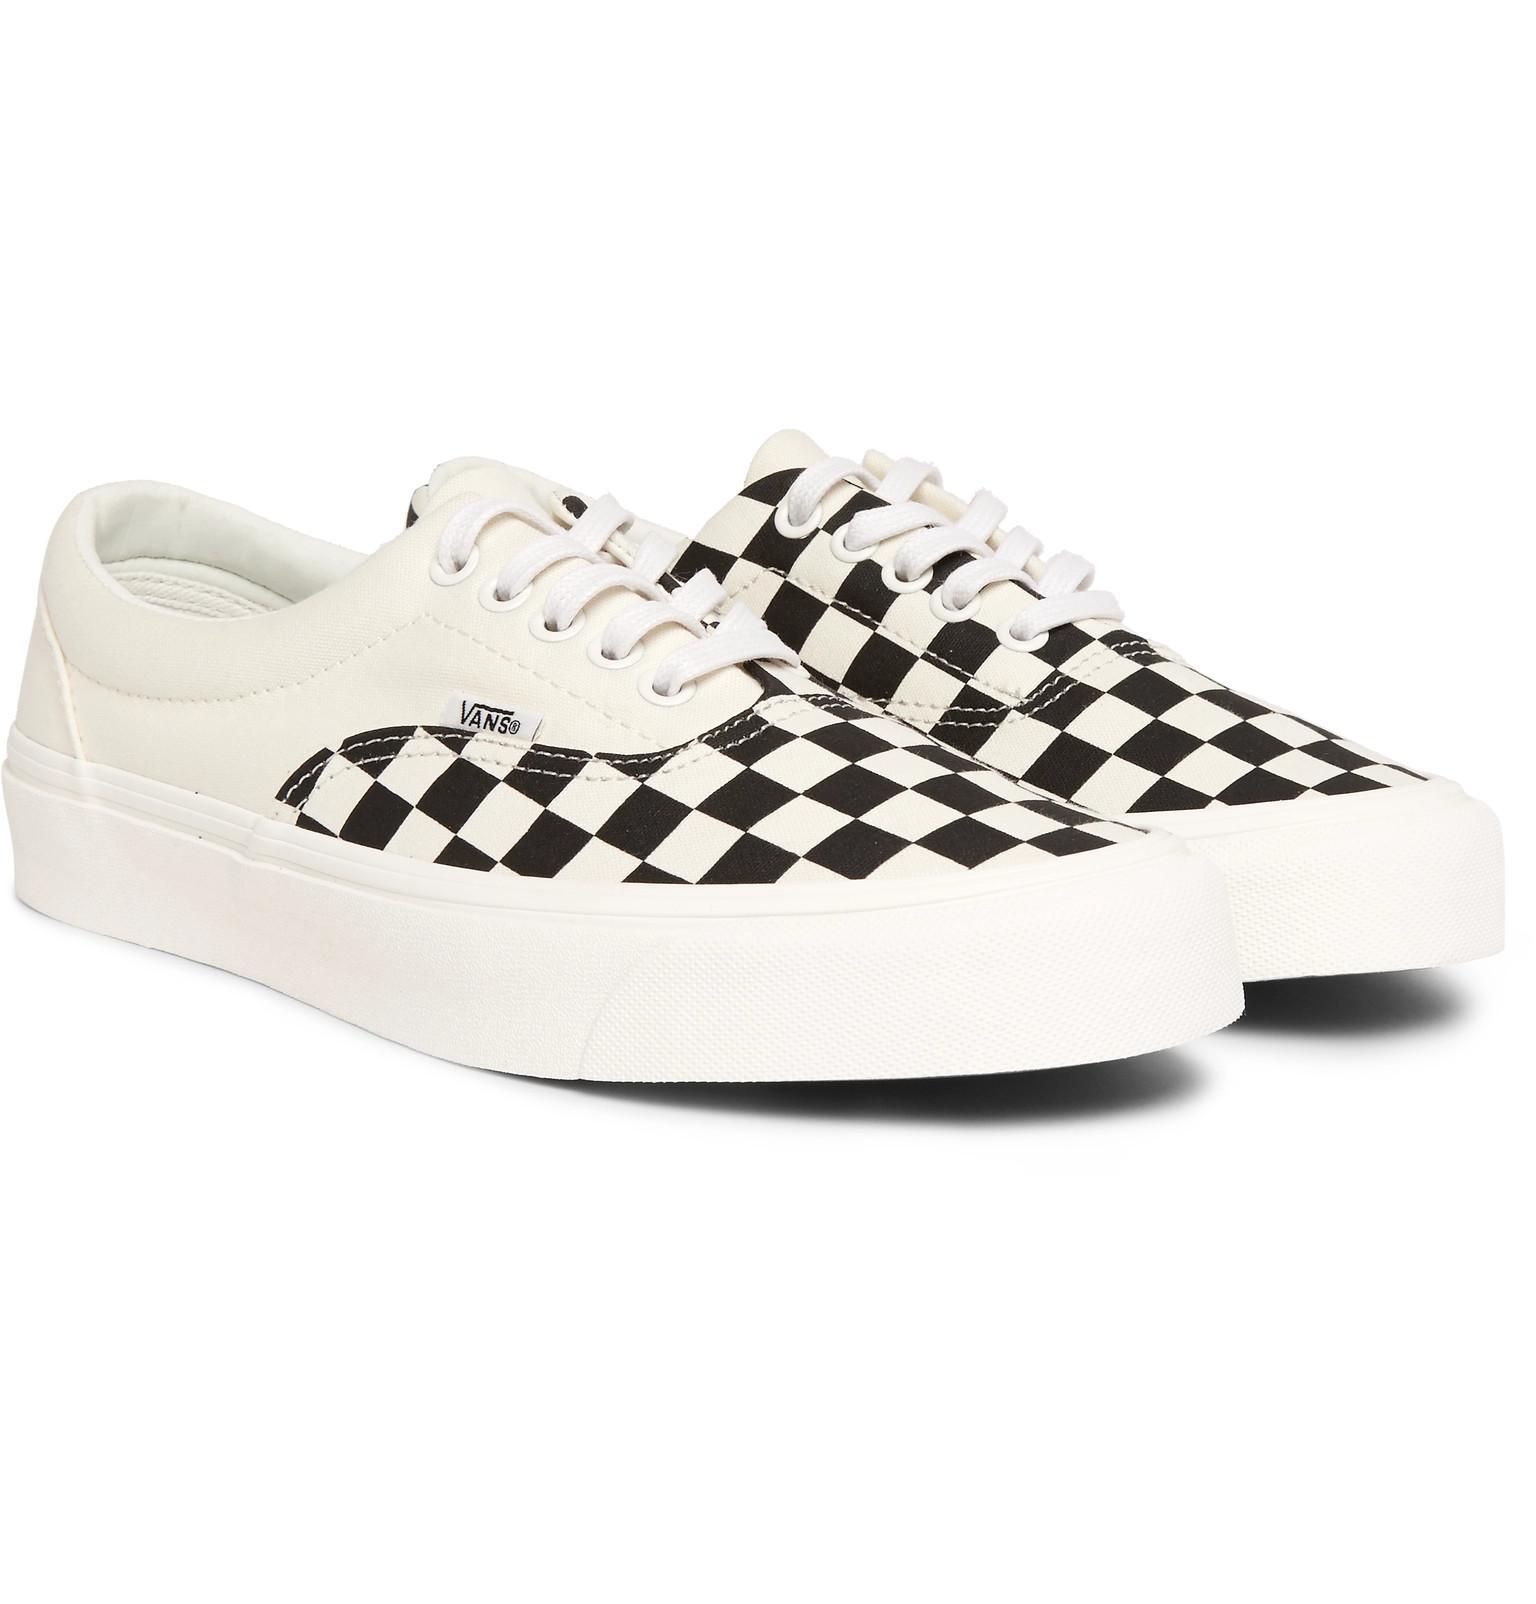 70591b94b7 Vans Era Checkerboard Canvas Sneakers in White for Men - Lyst